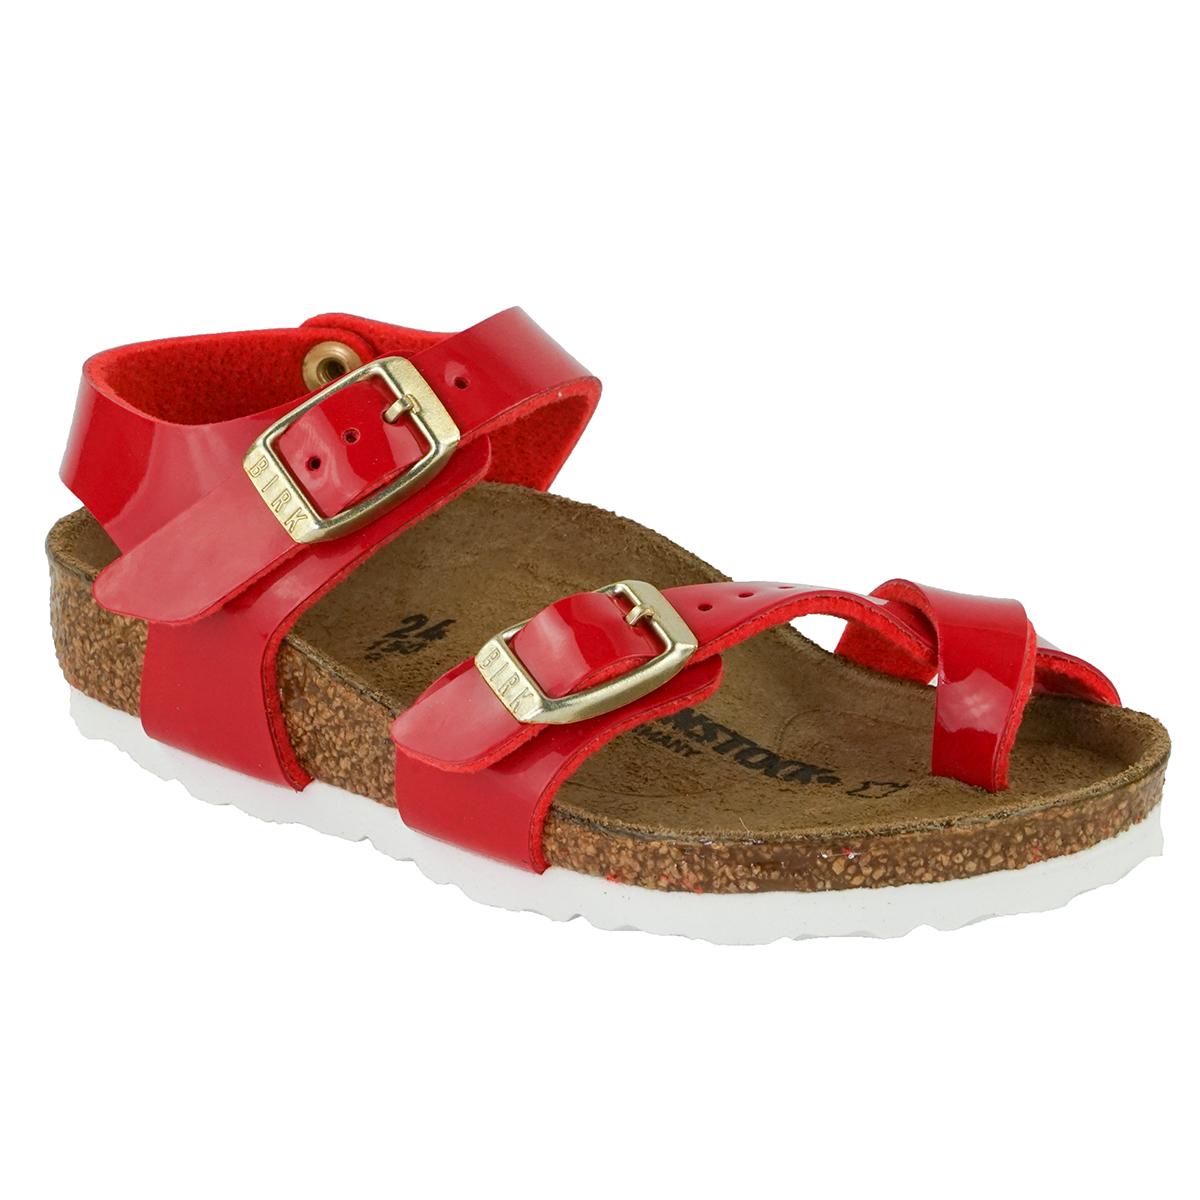 466c69da371b Details about Birkenstock Kid s Taormina Birko-Flor Patent Sandals